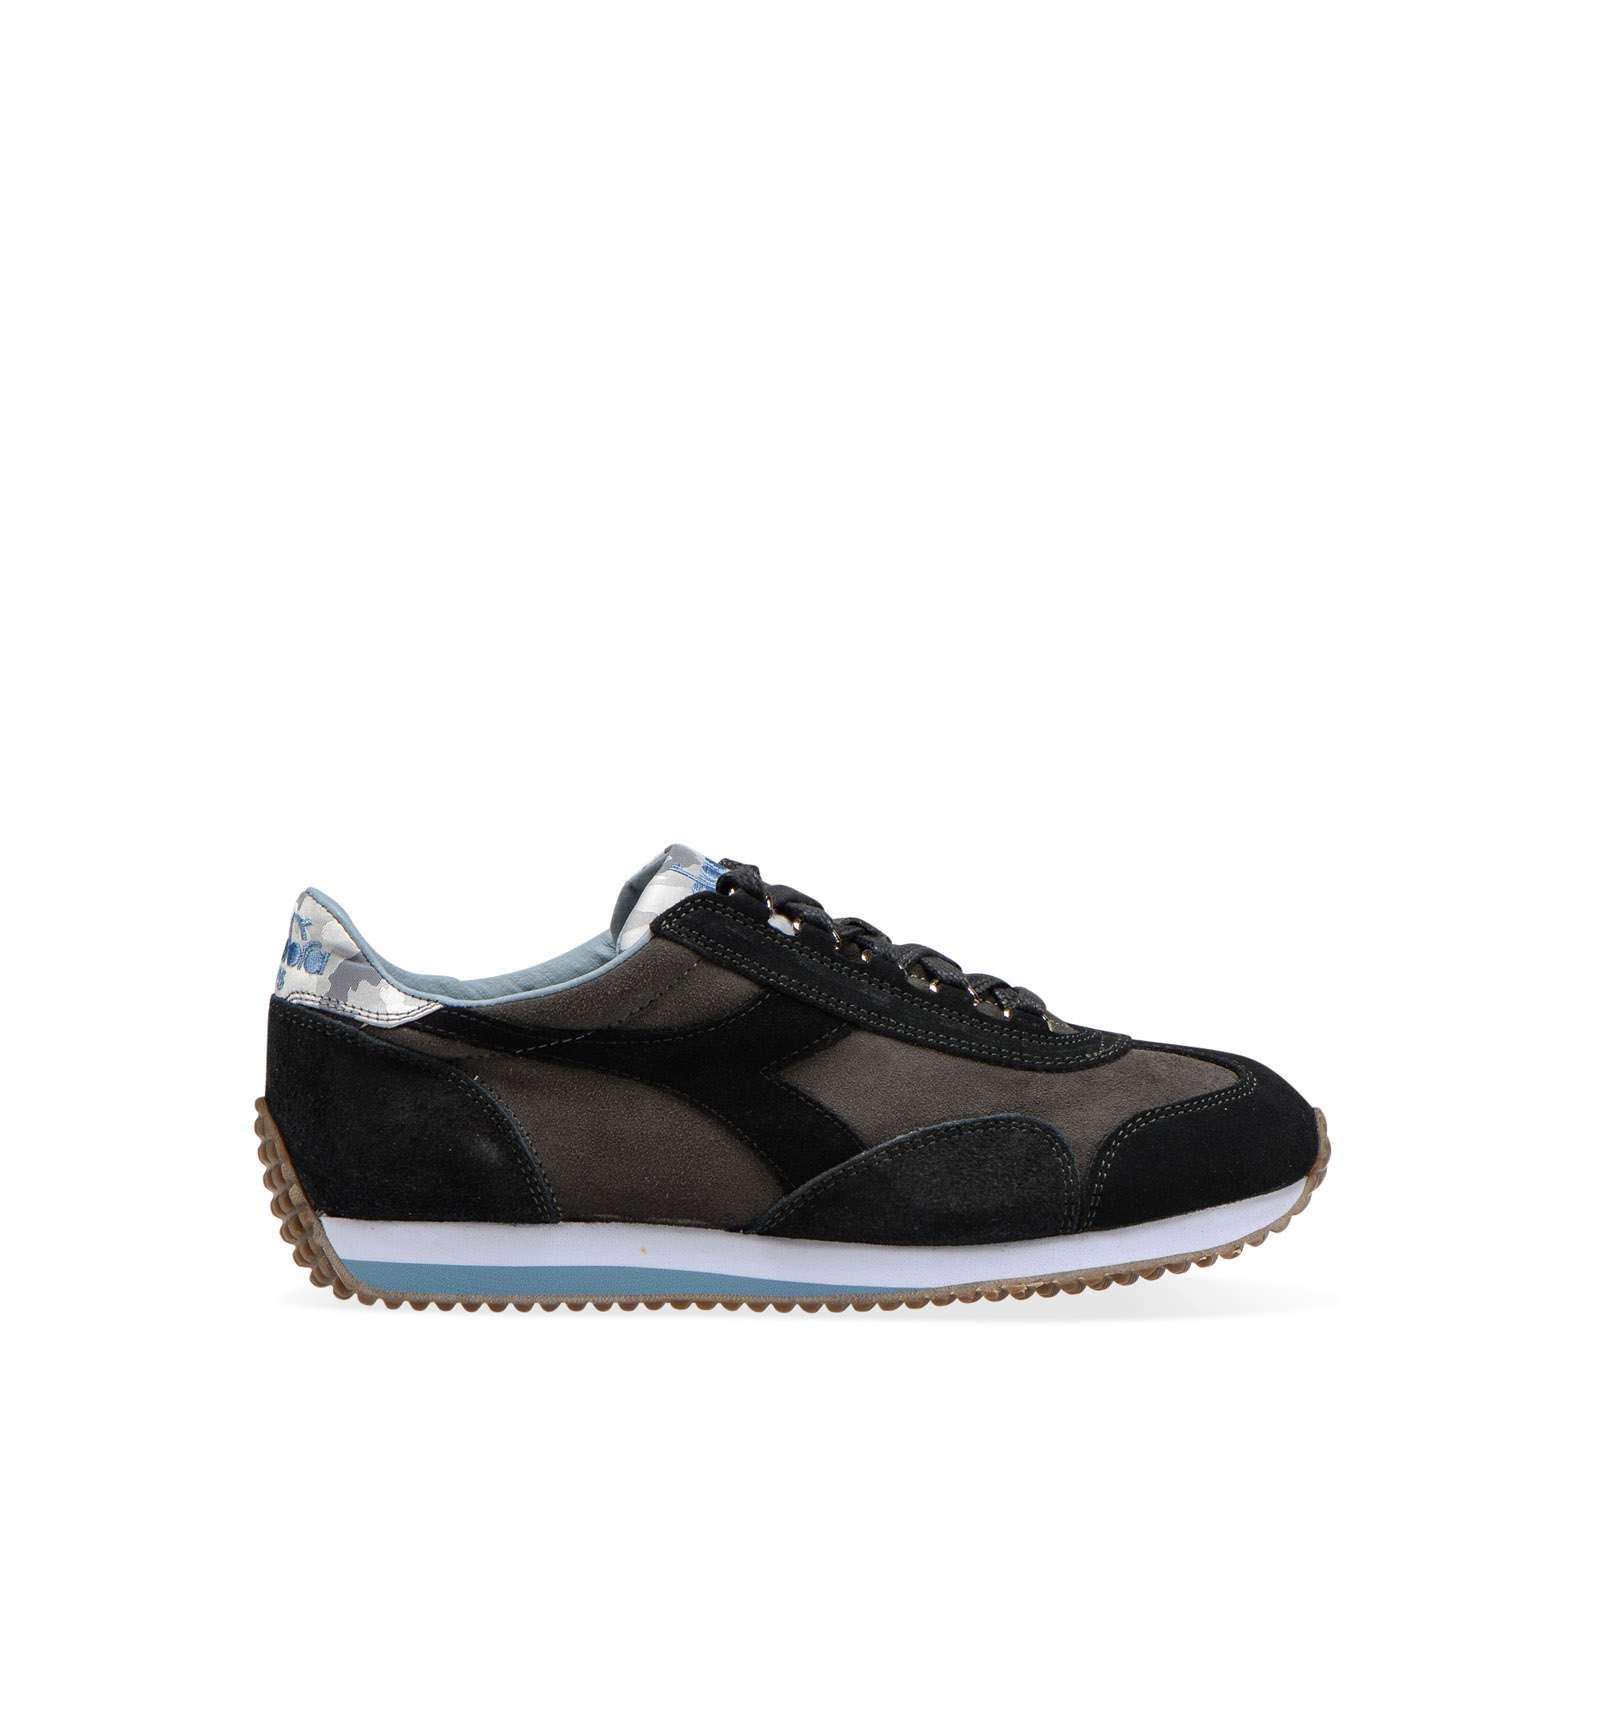 Armenise Sneaker Heritage Diadora Nino Calzature Xtvztq